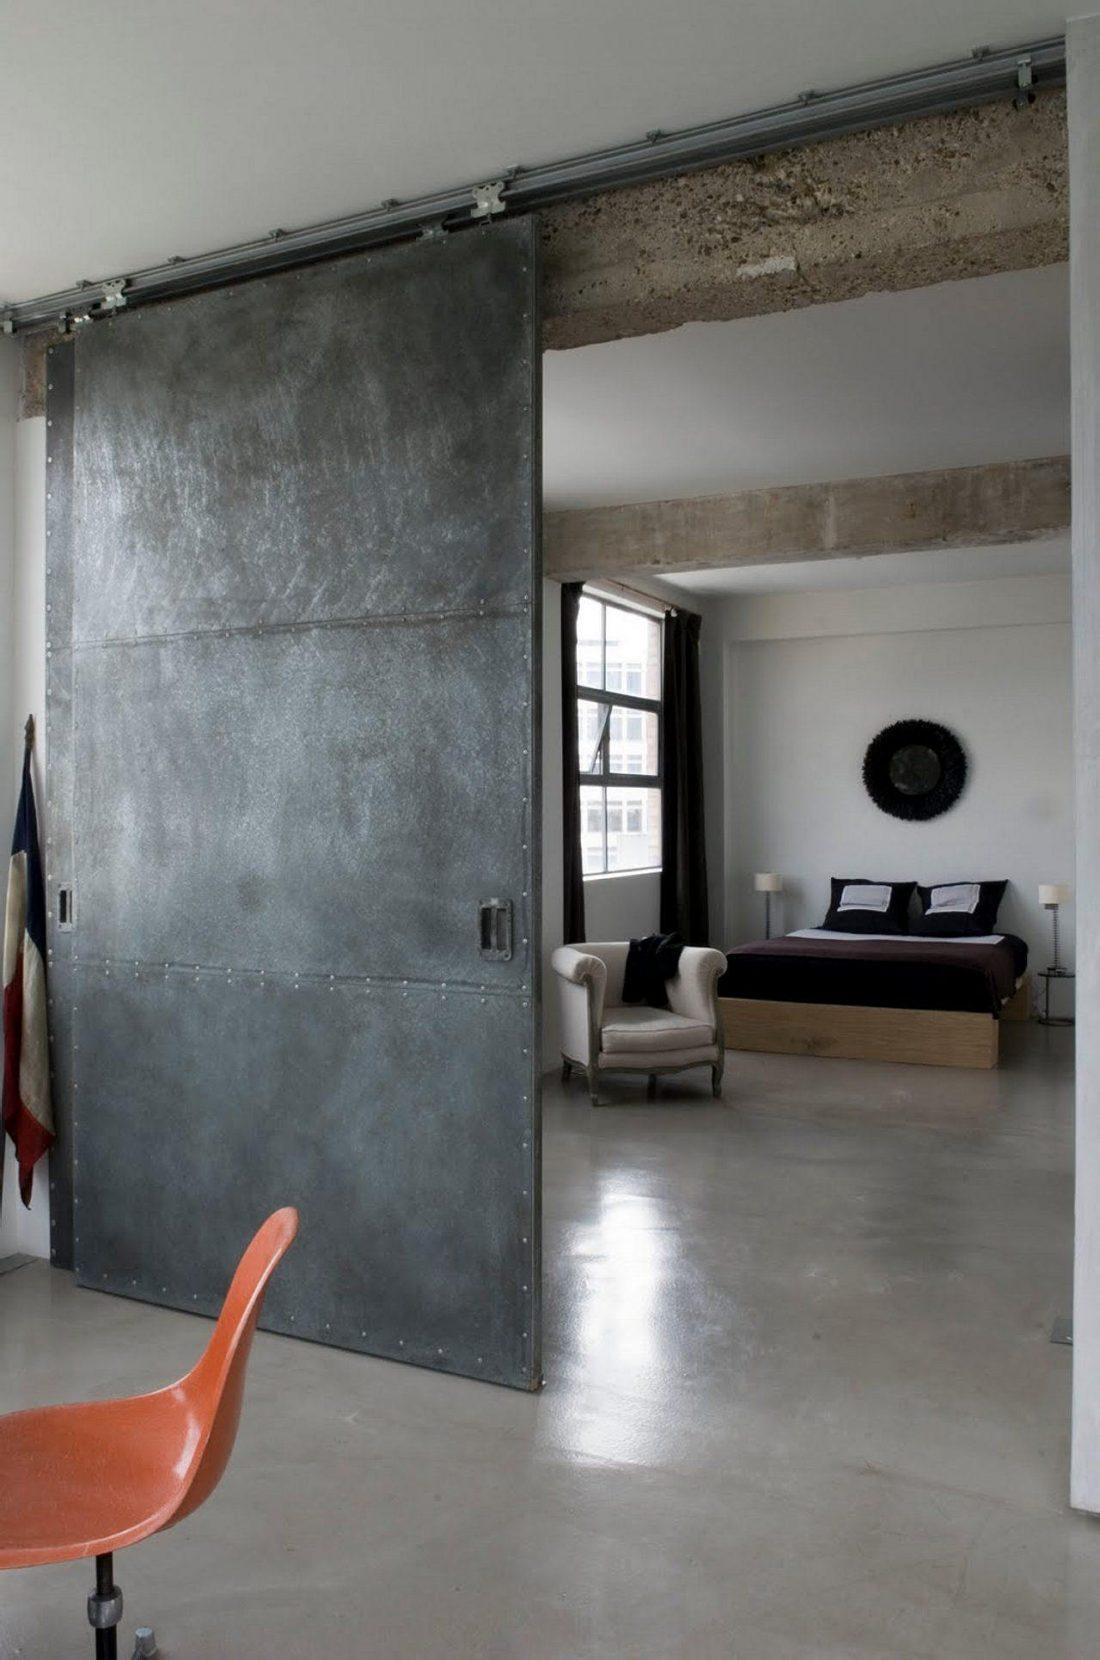 Дизайн интерьера квартиры в стиле лофт 19